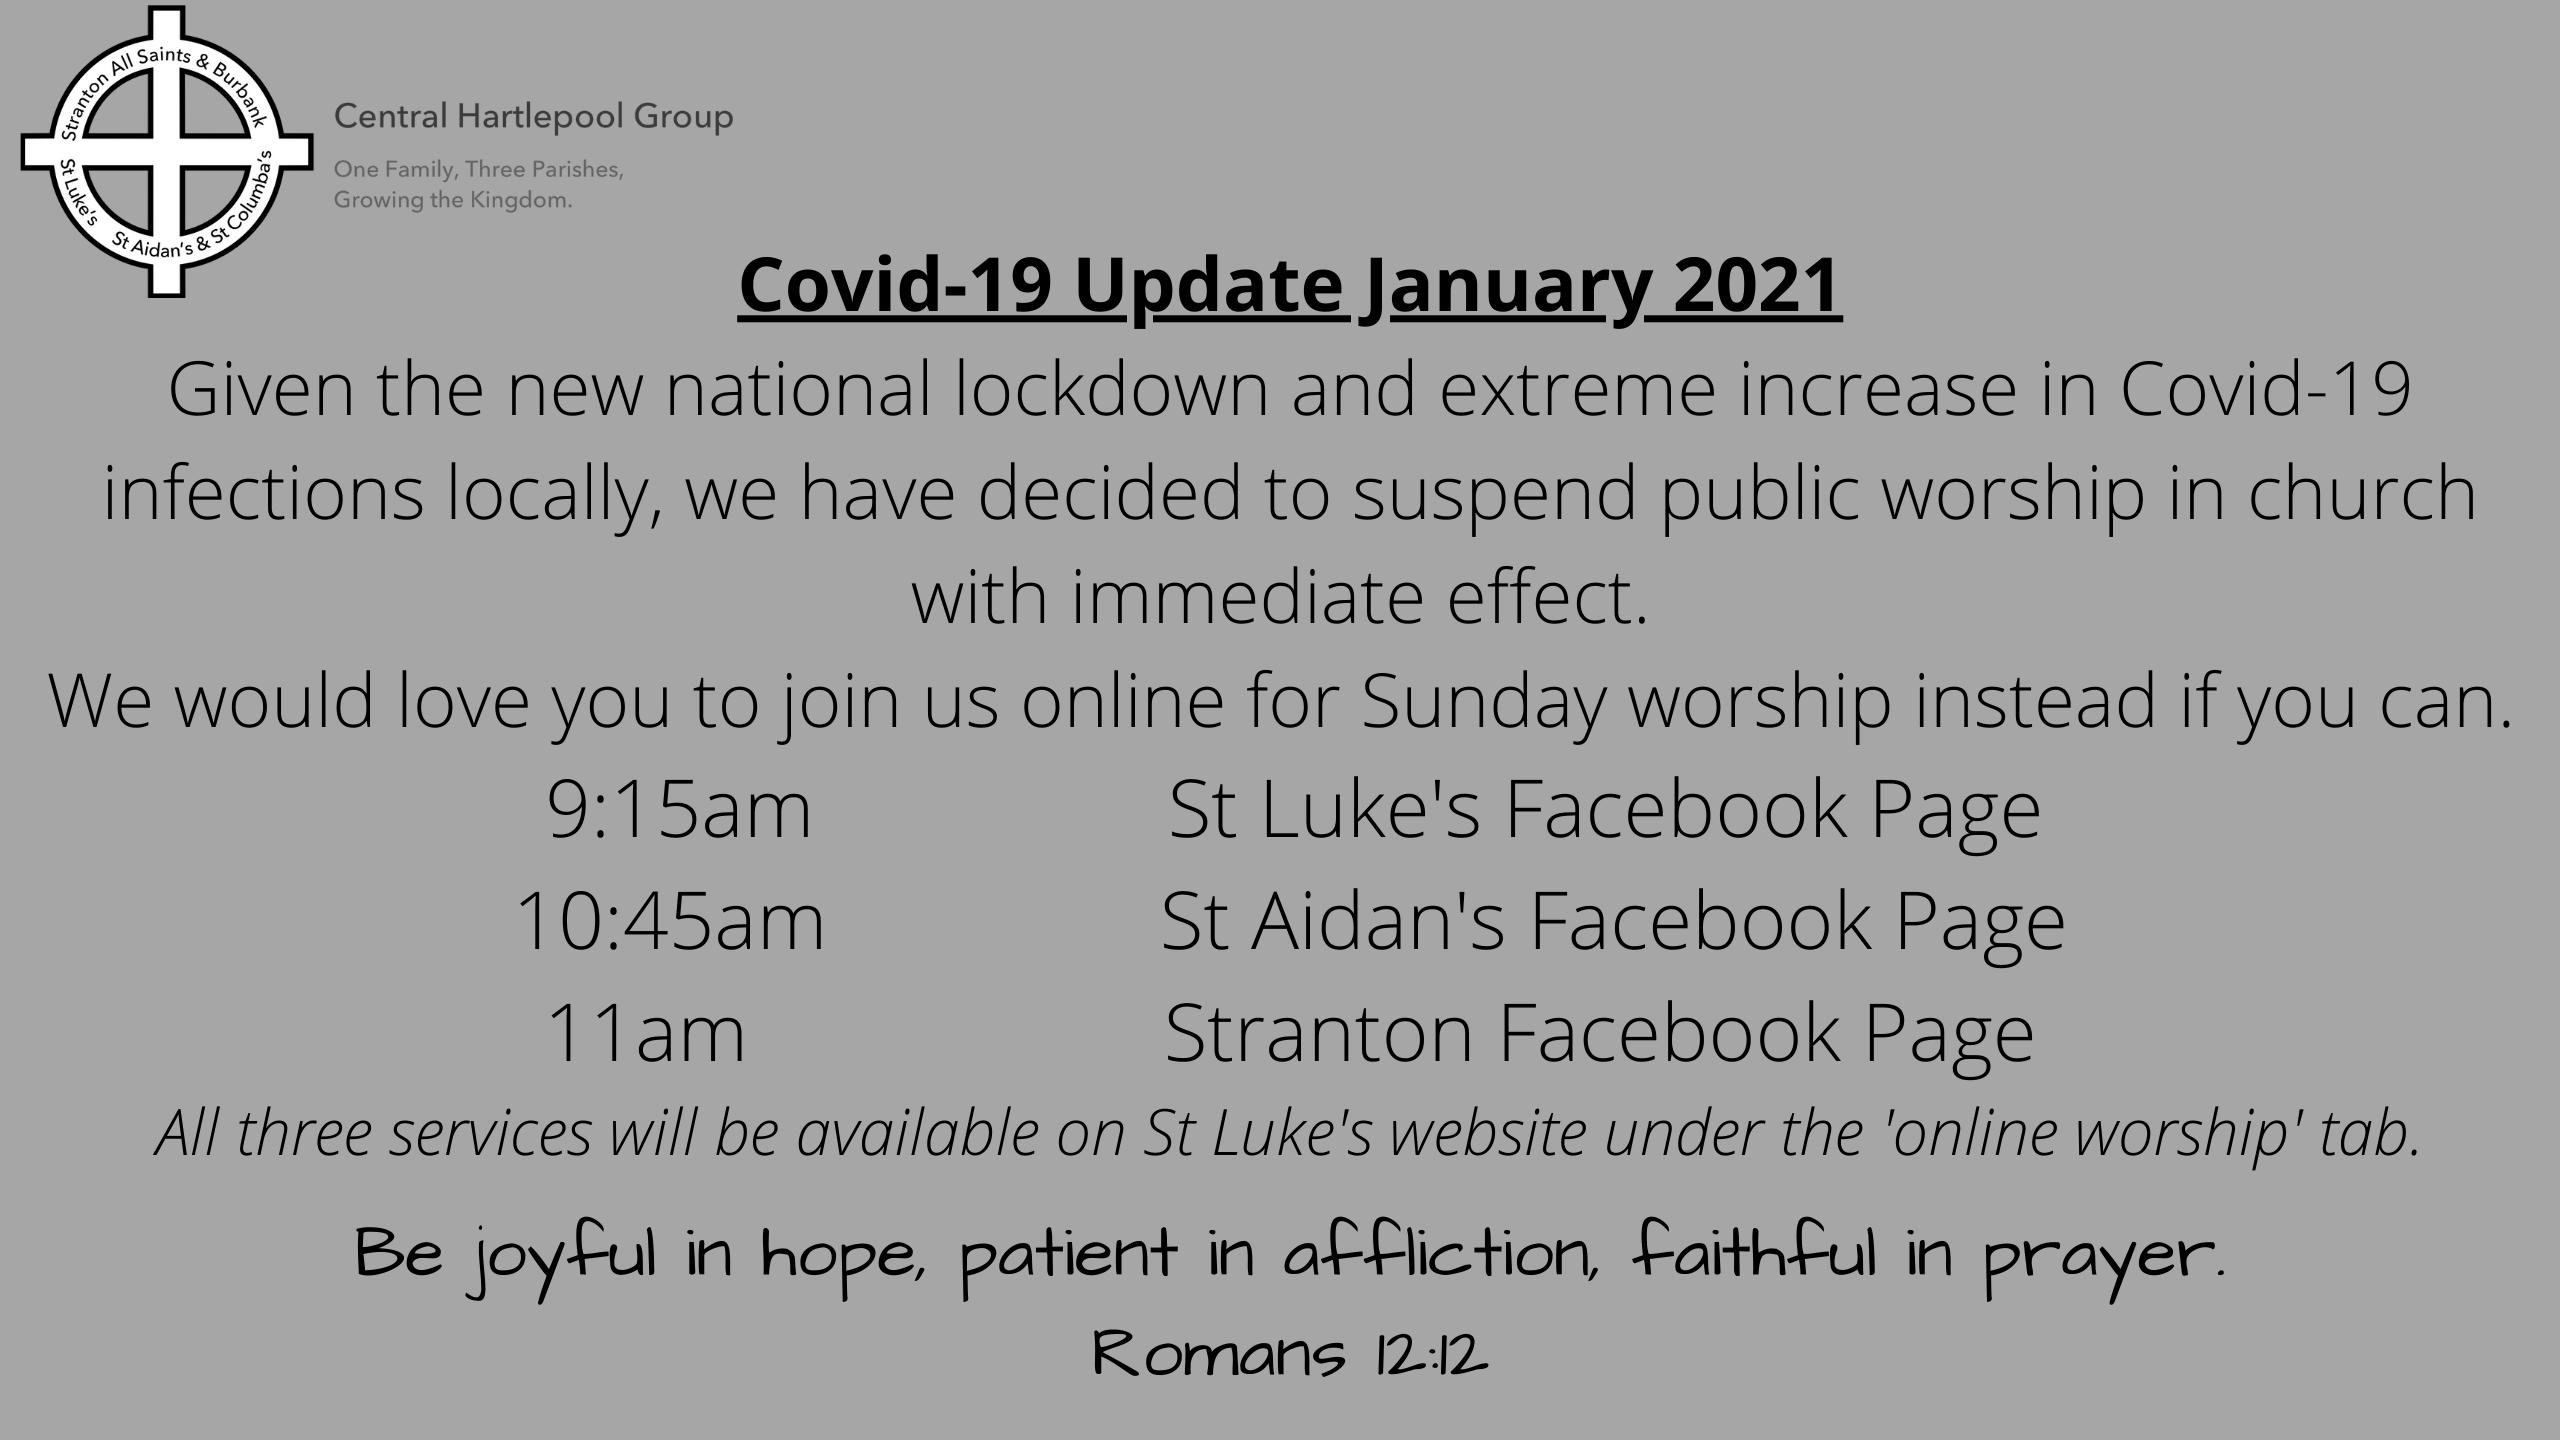 Covid-19 Update Jan 2021 website